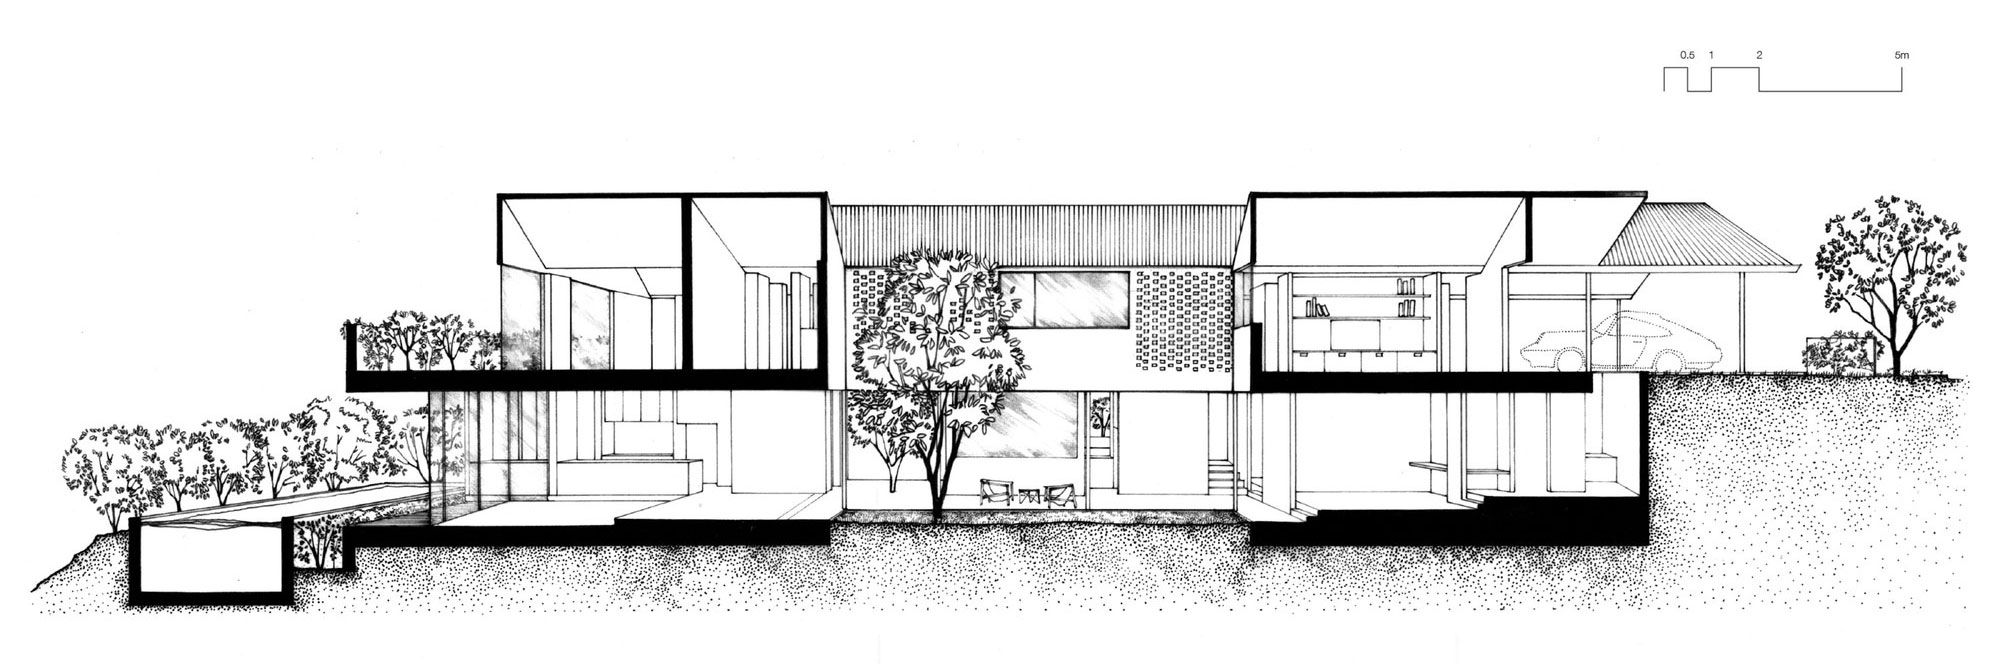 Christian-Street-House-20